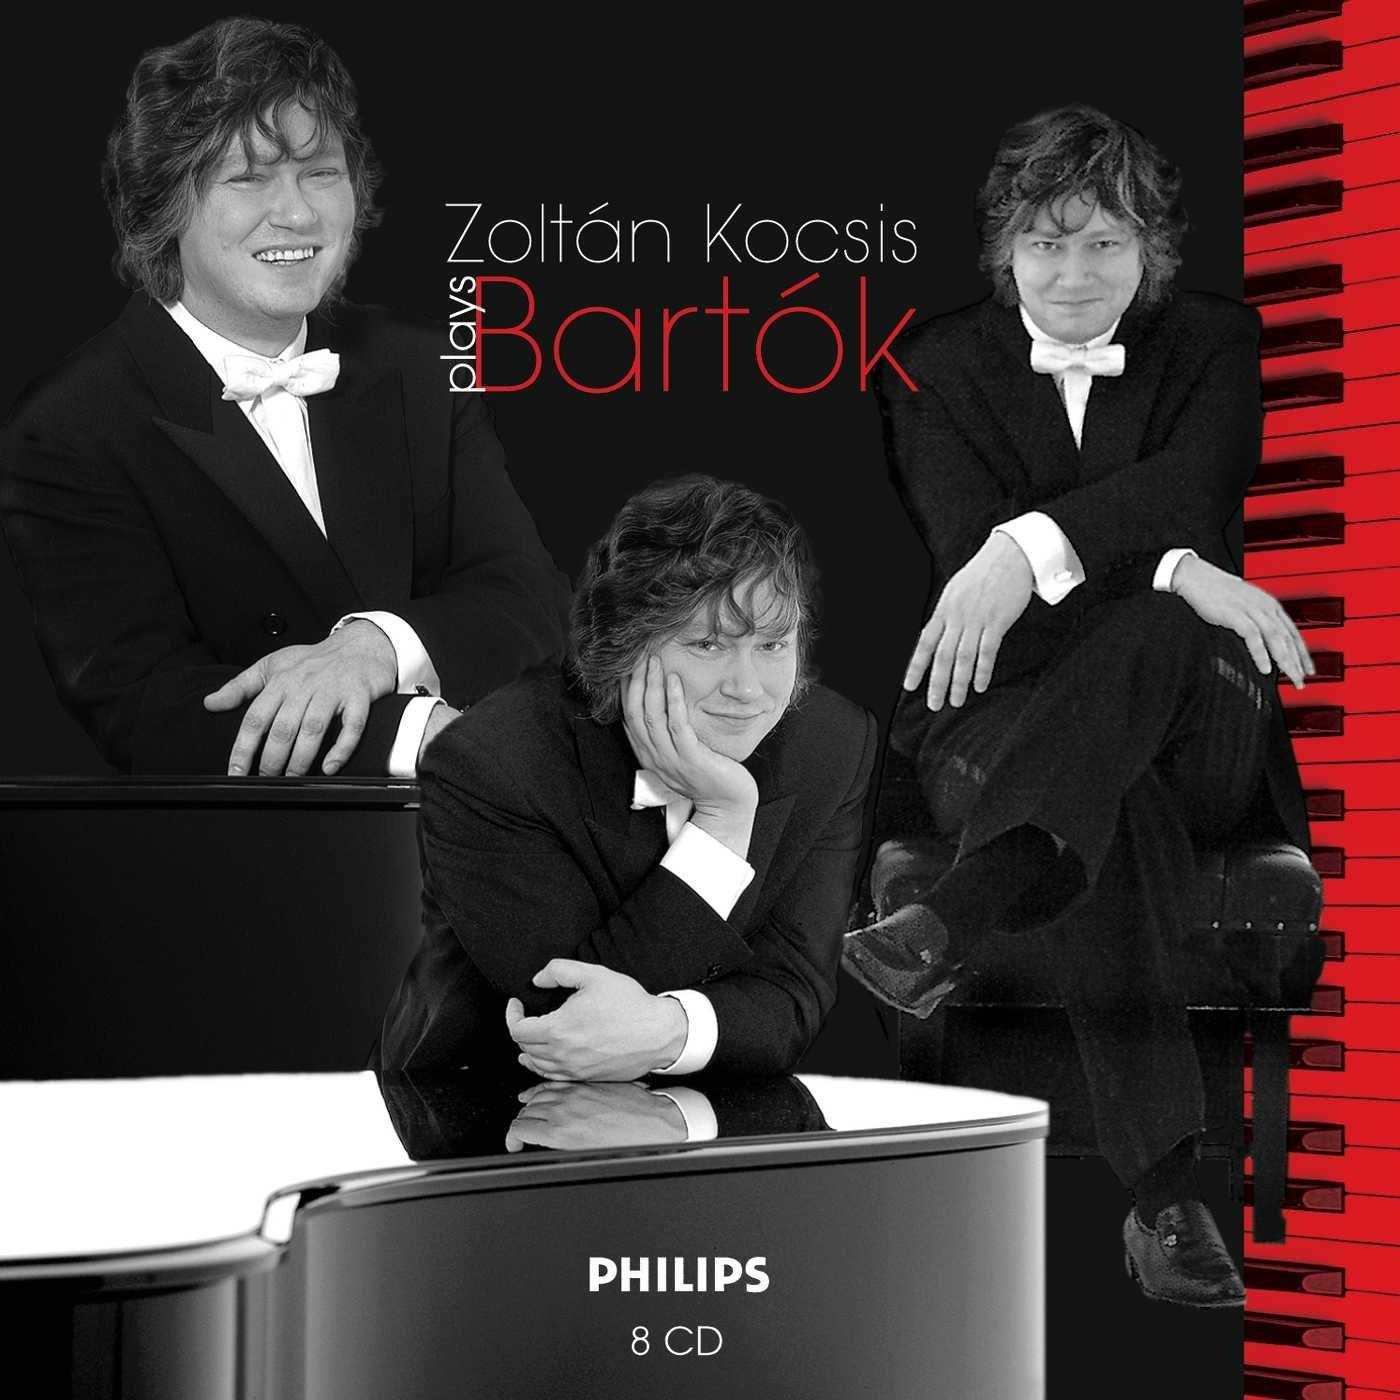 Zoltan Kocsis Plays Bartok by Philips